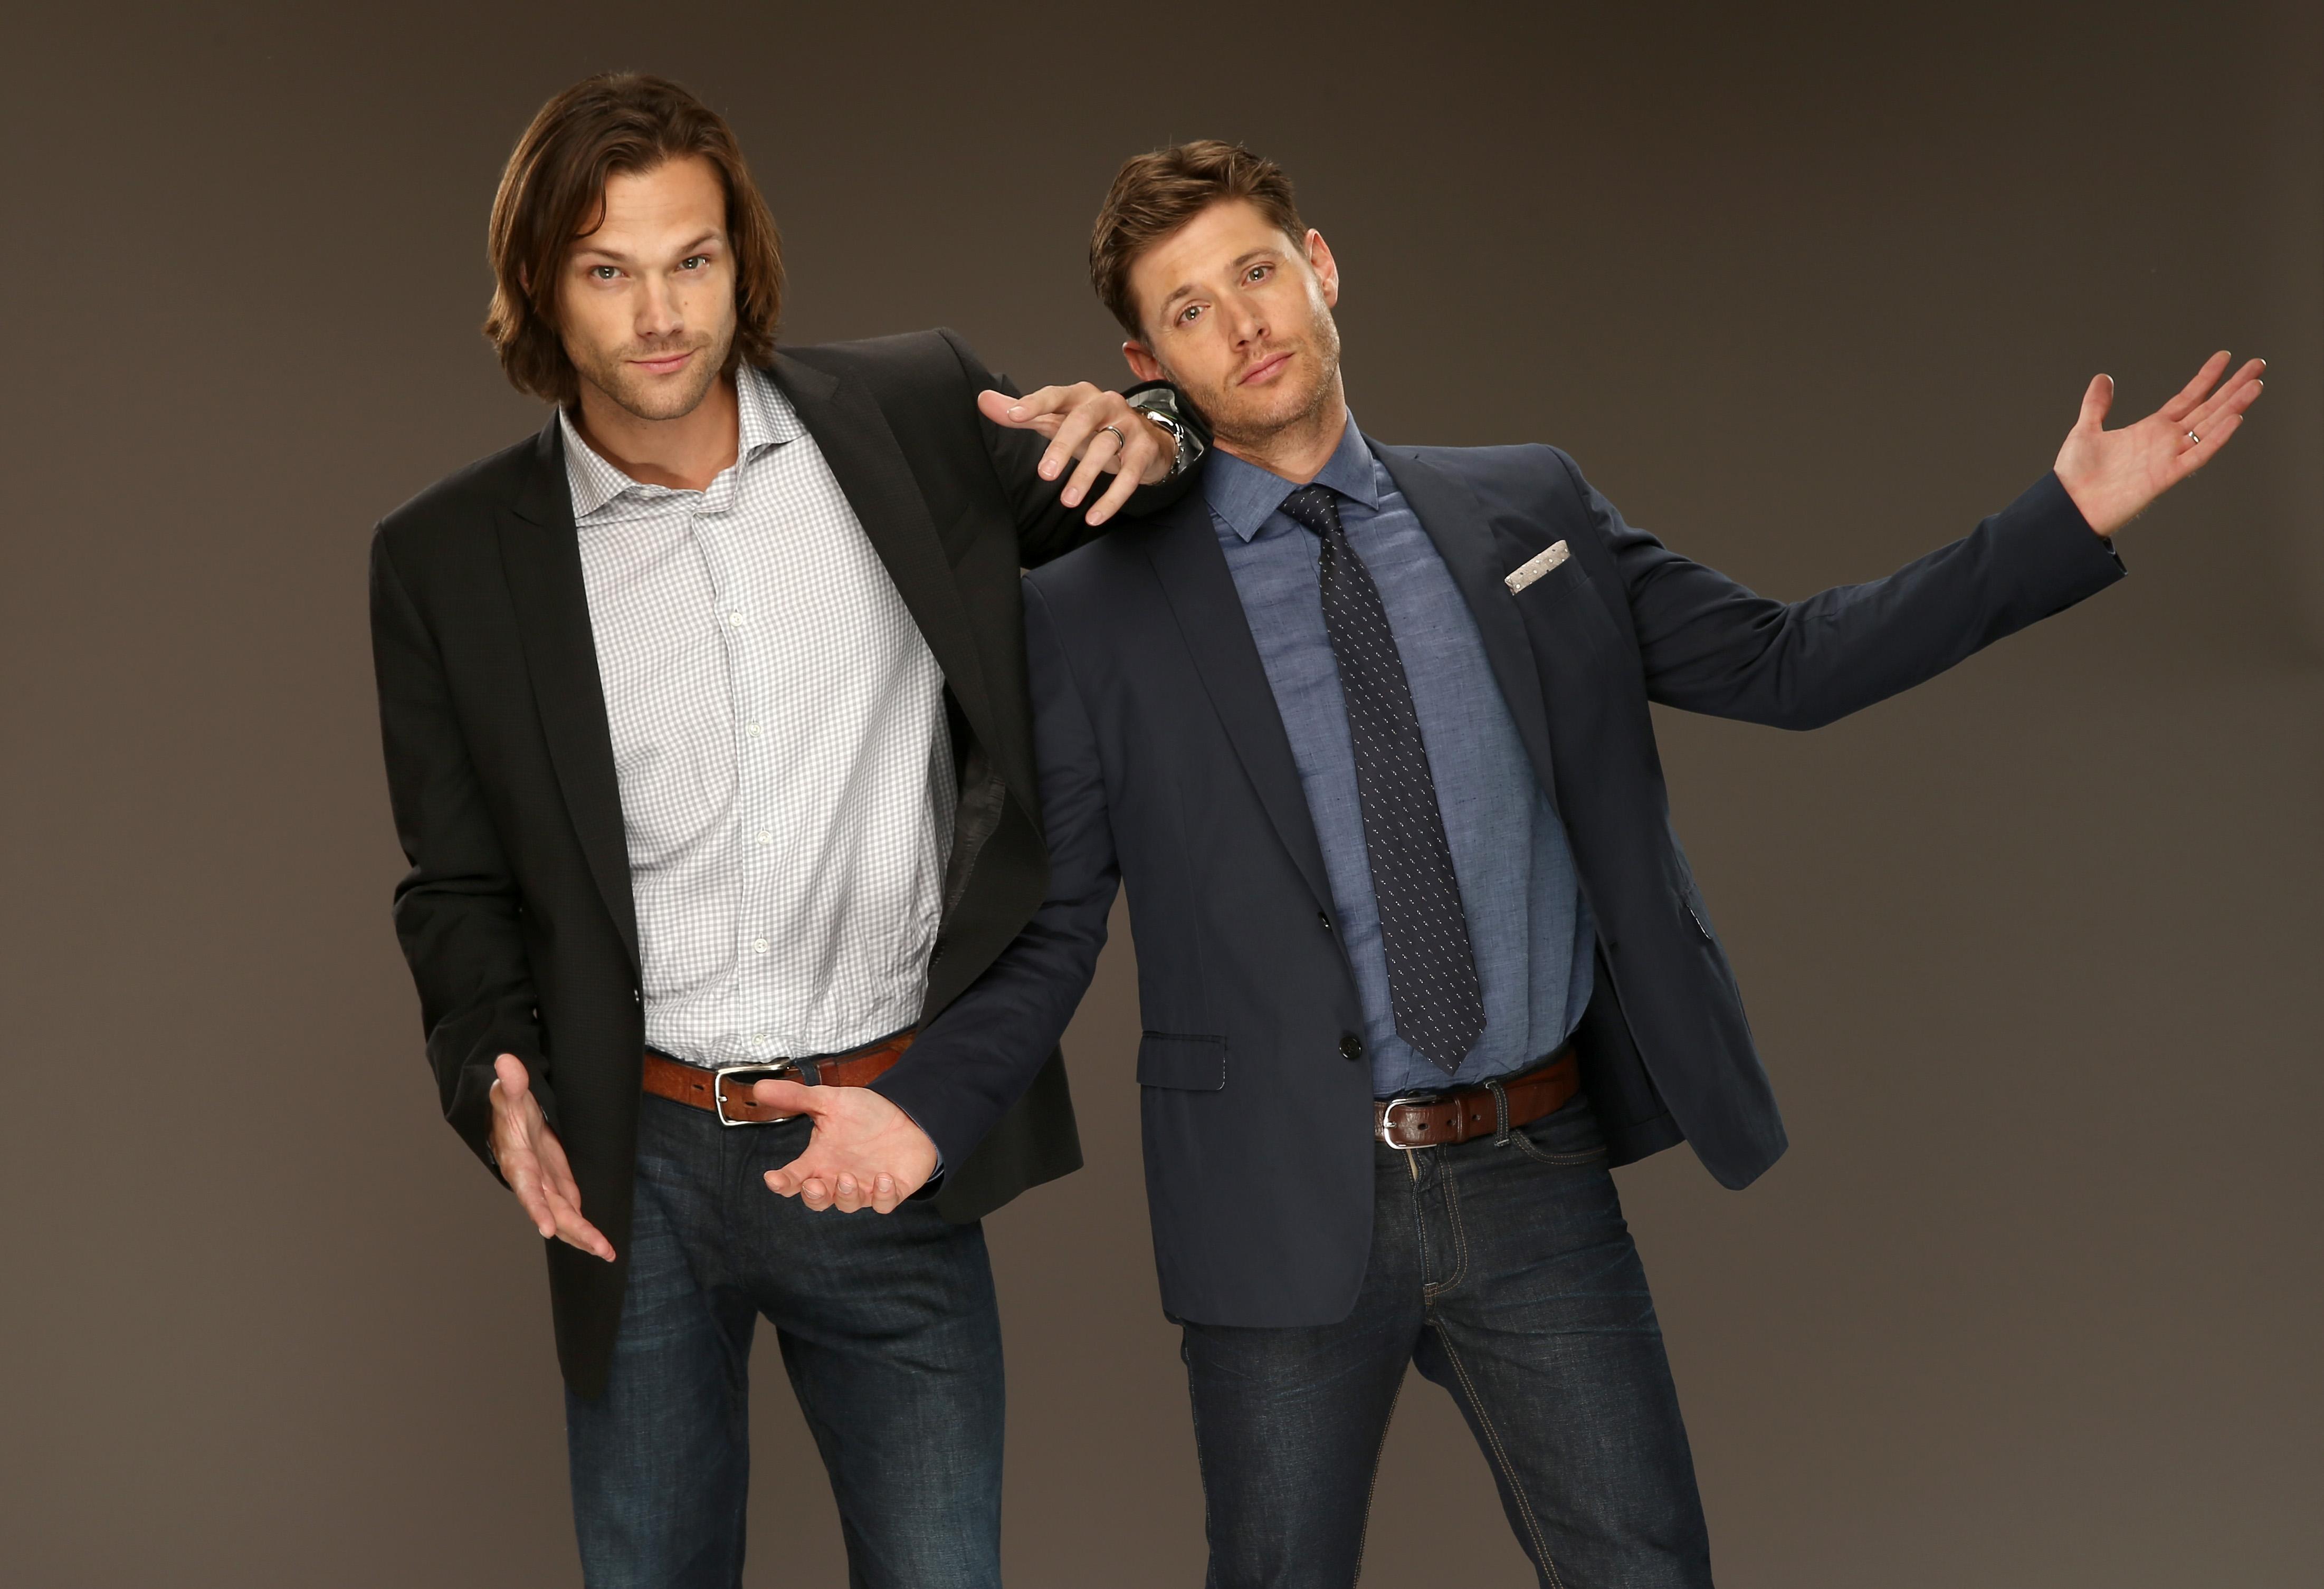 Are Supernatural Stars Jensen Ackles Jared Padalecki Friends In Real Life Relax Guys